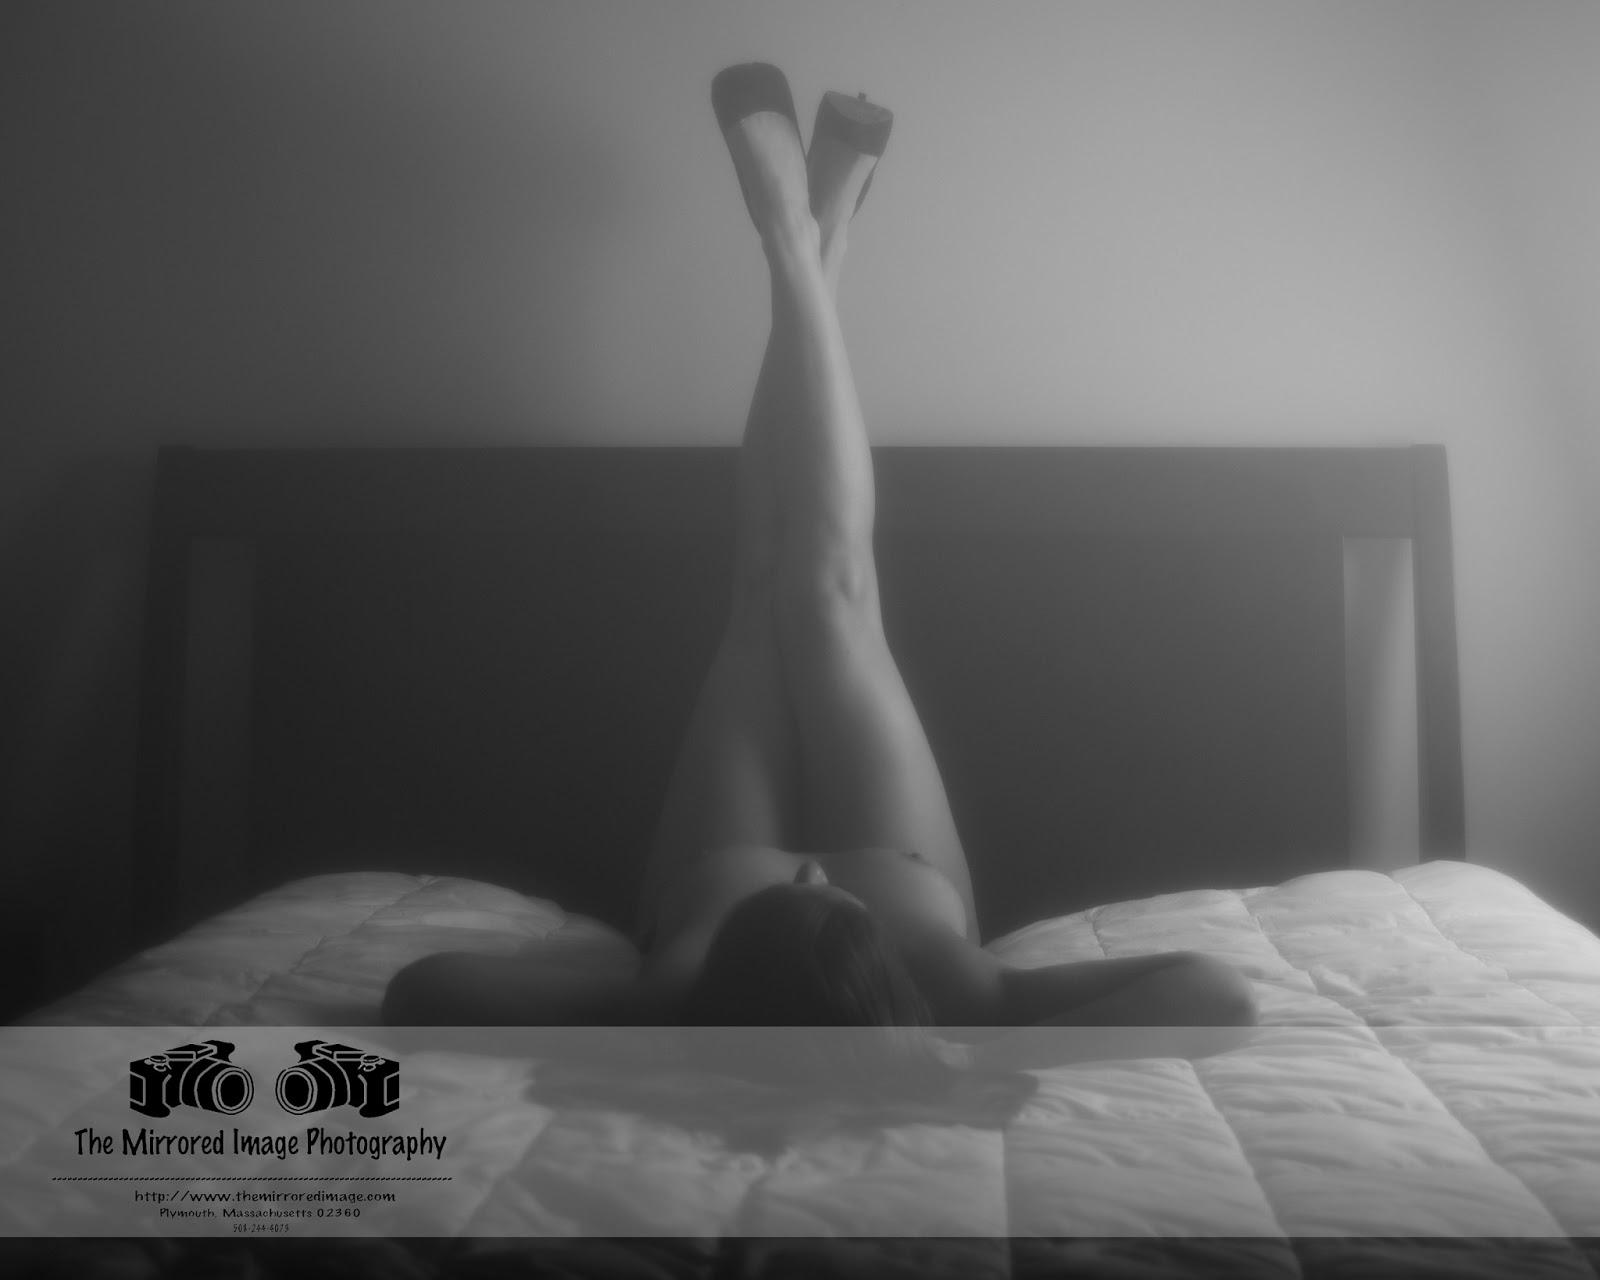 Hahnrei boudoir fotografie igfap foto 1